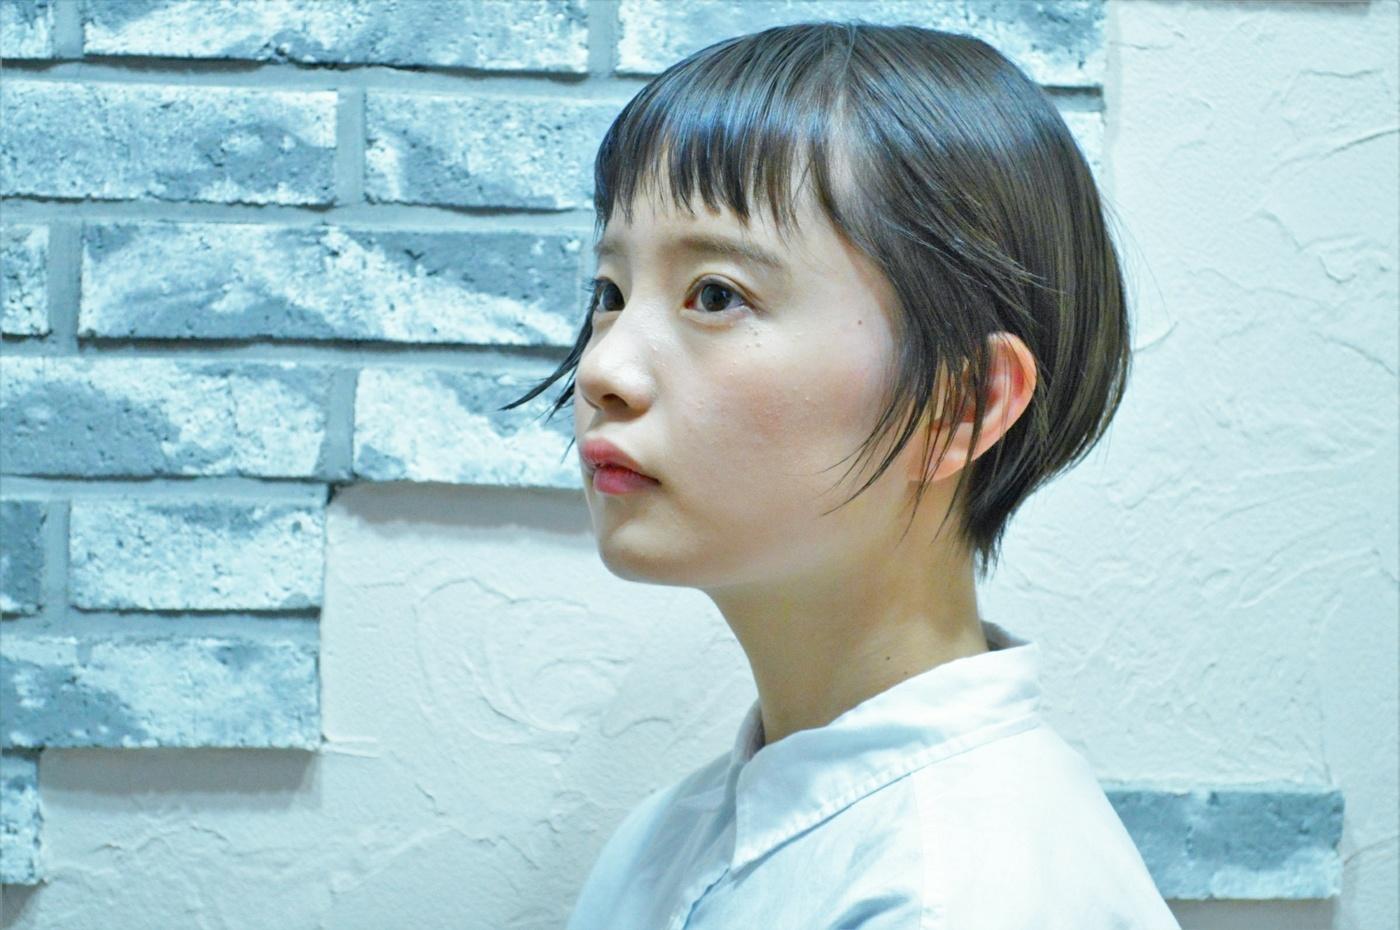 Harada Tomohikoが投稿した画像